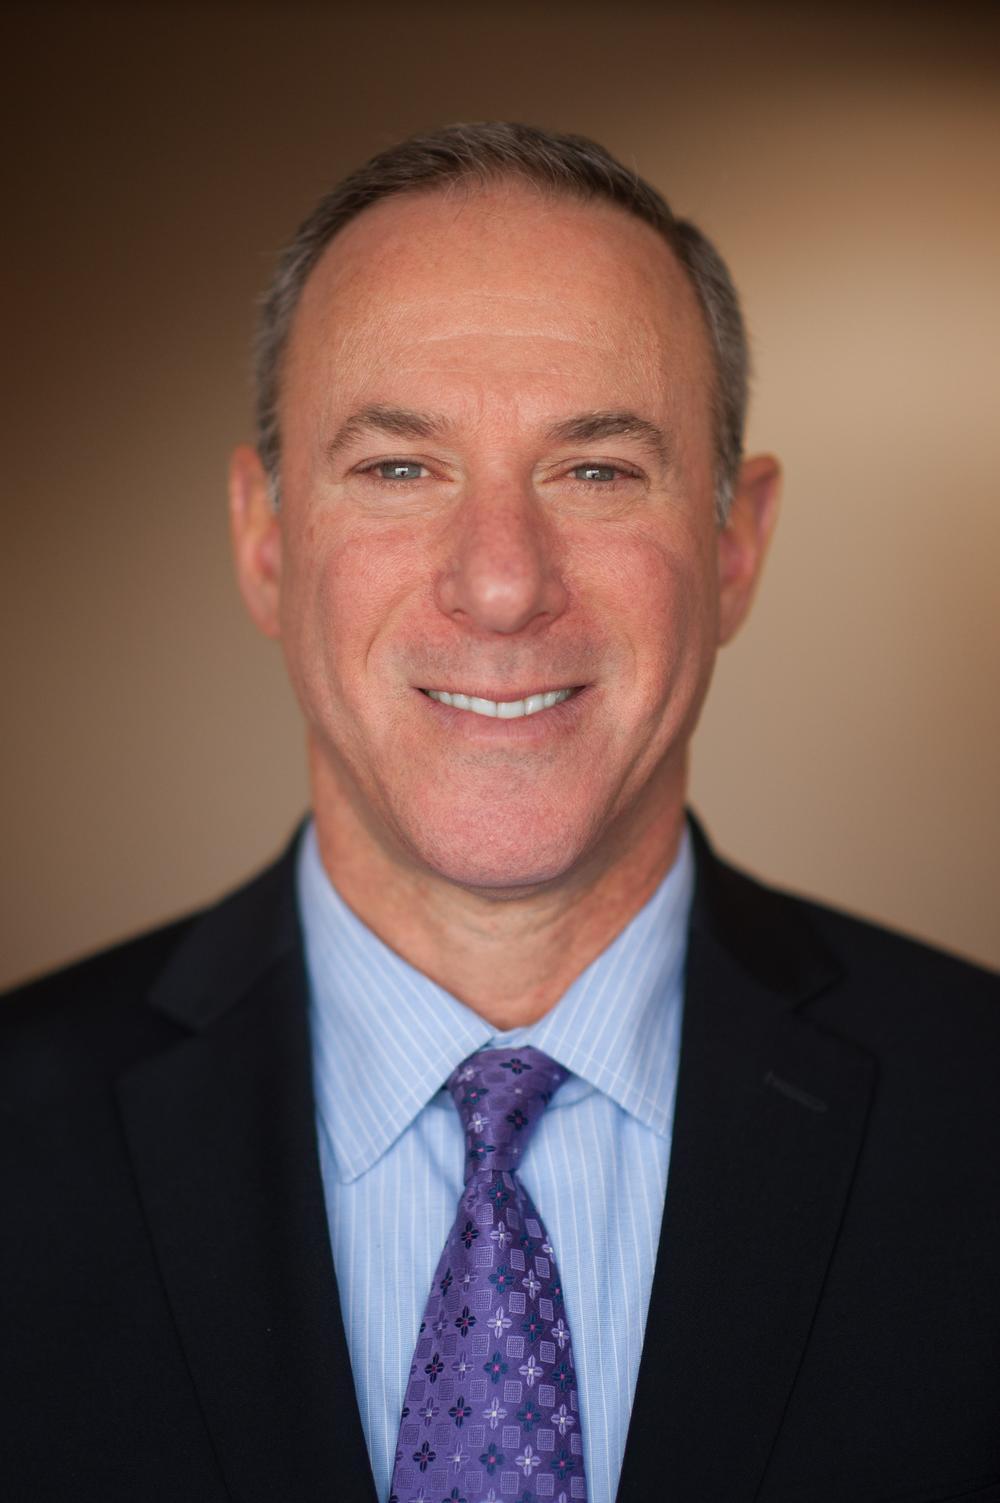 Jay P. Levin, CFP® Photo